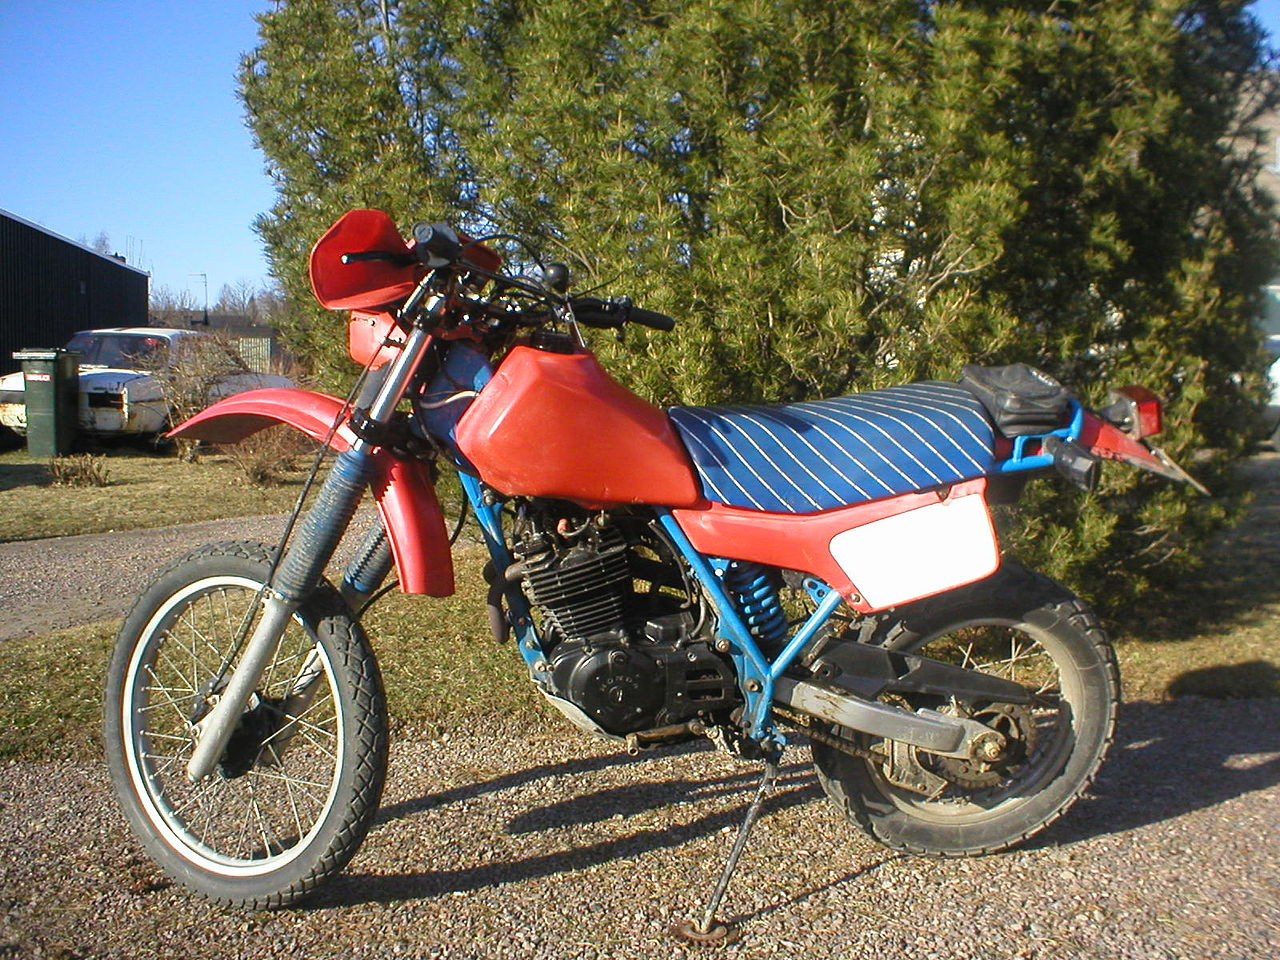 File:Offroad1 Honda XR500R 1982.JPG - Wikimedia Commons